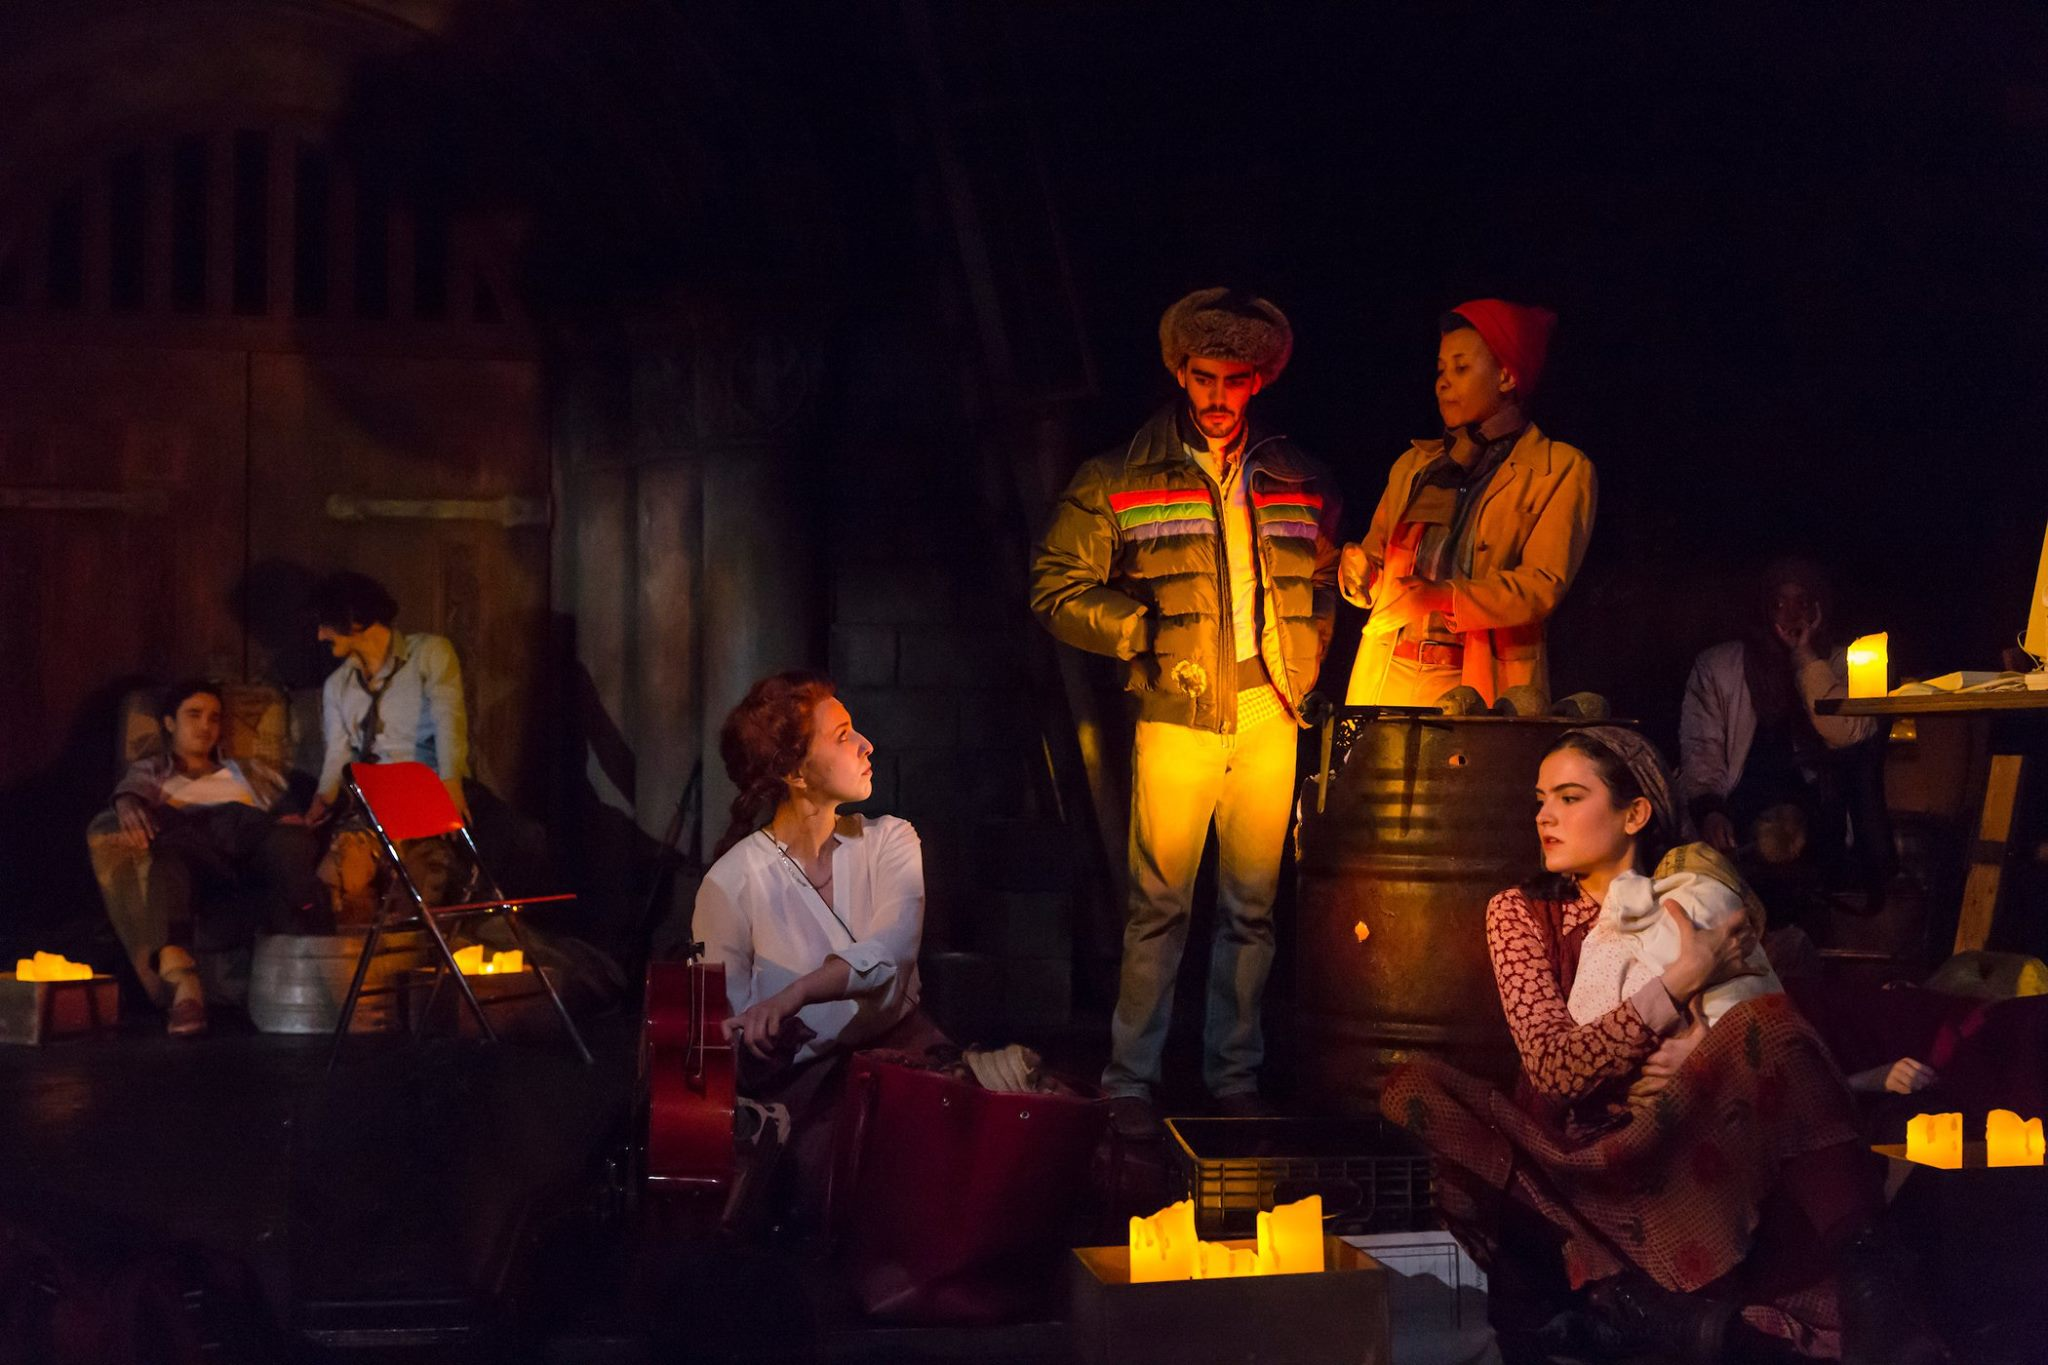 Abdel Rahman (Abubakr Ali), Raif (Jose Espinosa), Amira (Danielle Chaves), Gregori (William Nixon) Antonio (Kineta Kunutu), Cleopatra (Isabella Giovannini)